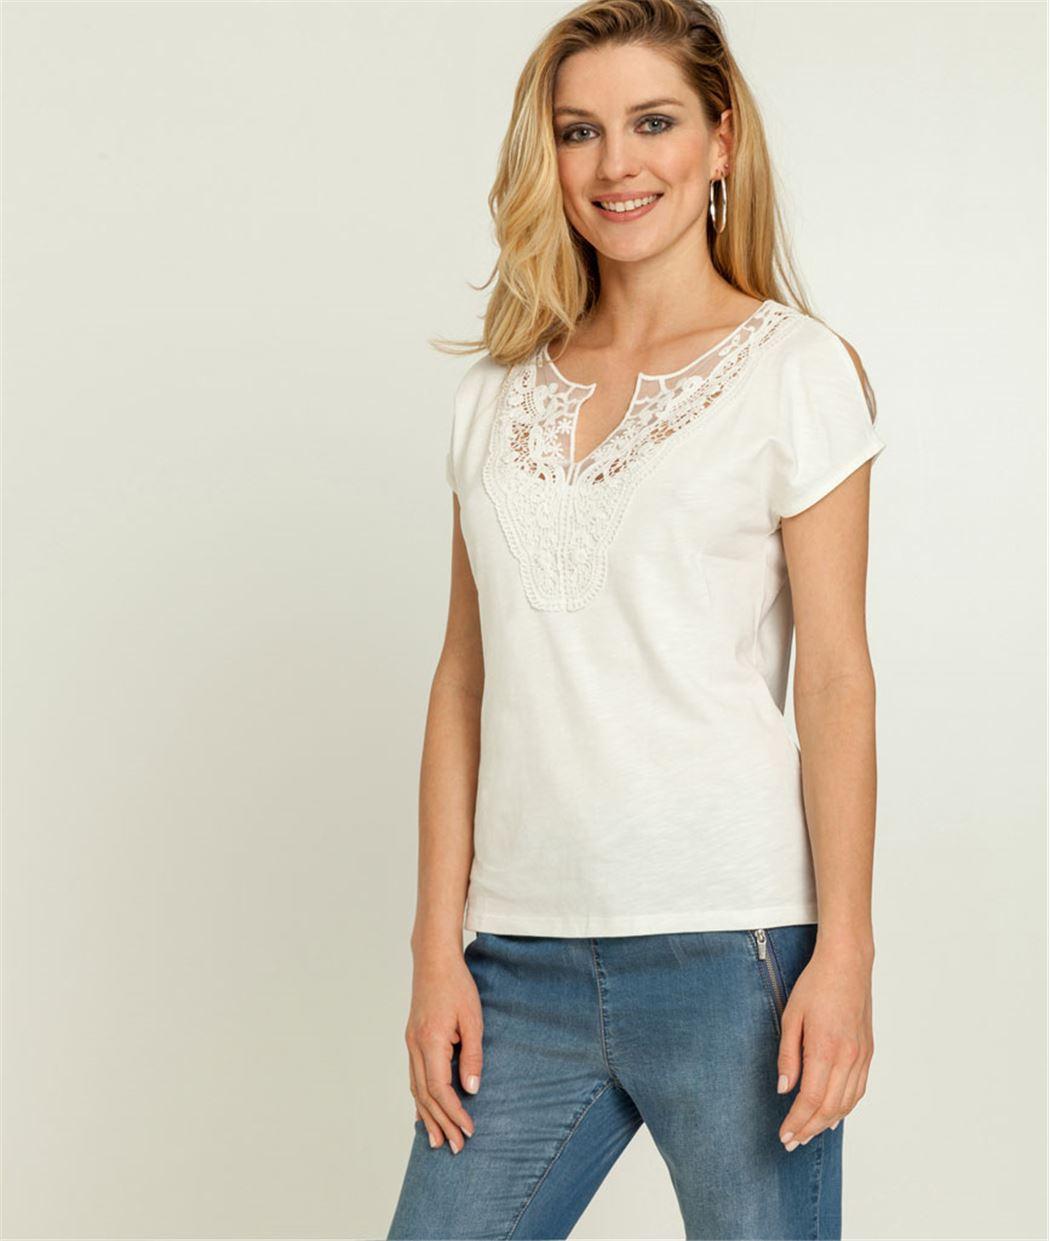 T-shirt femme dentelle + épaules fendues BLANC